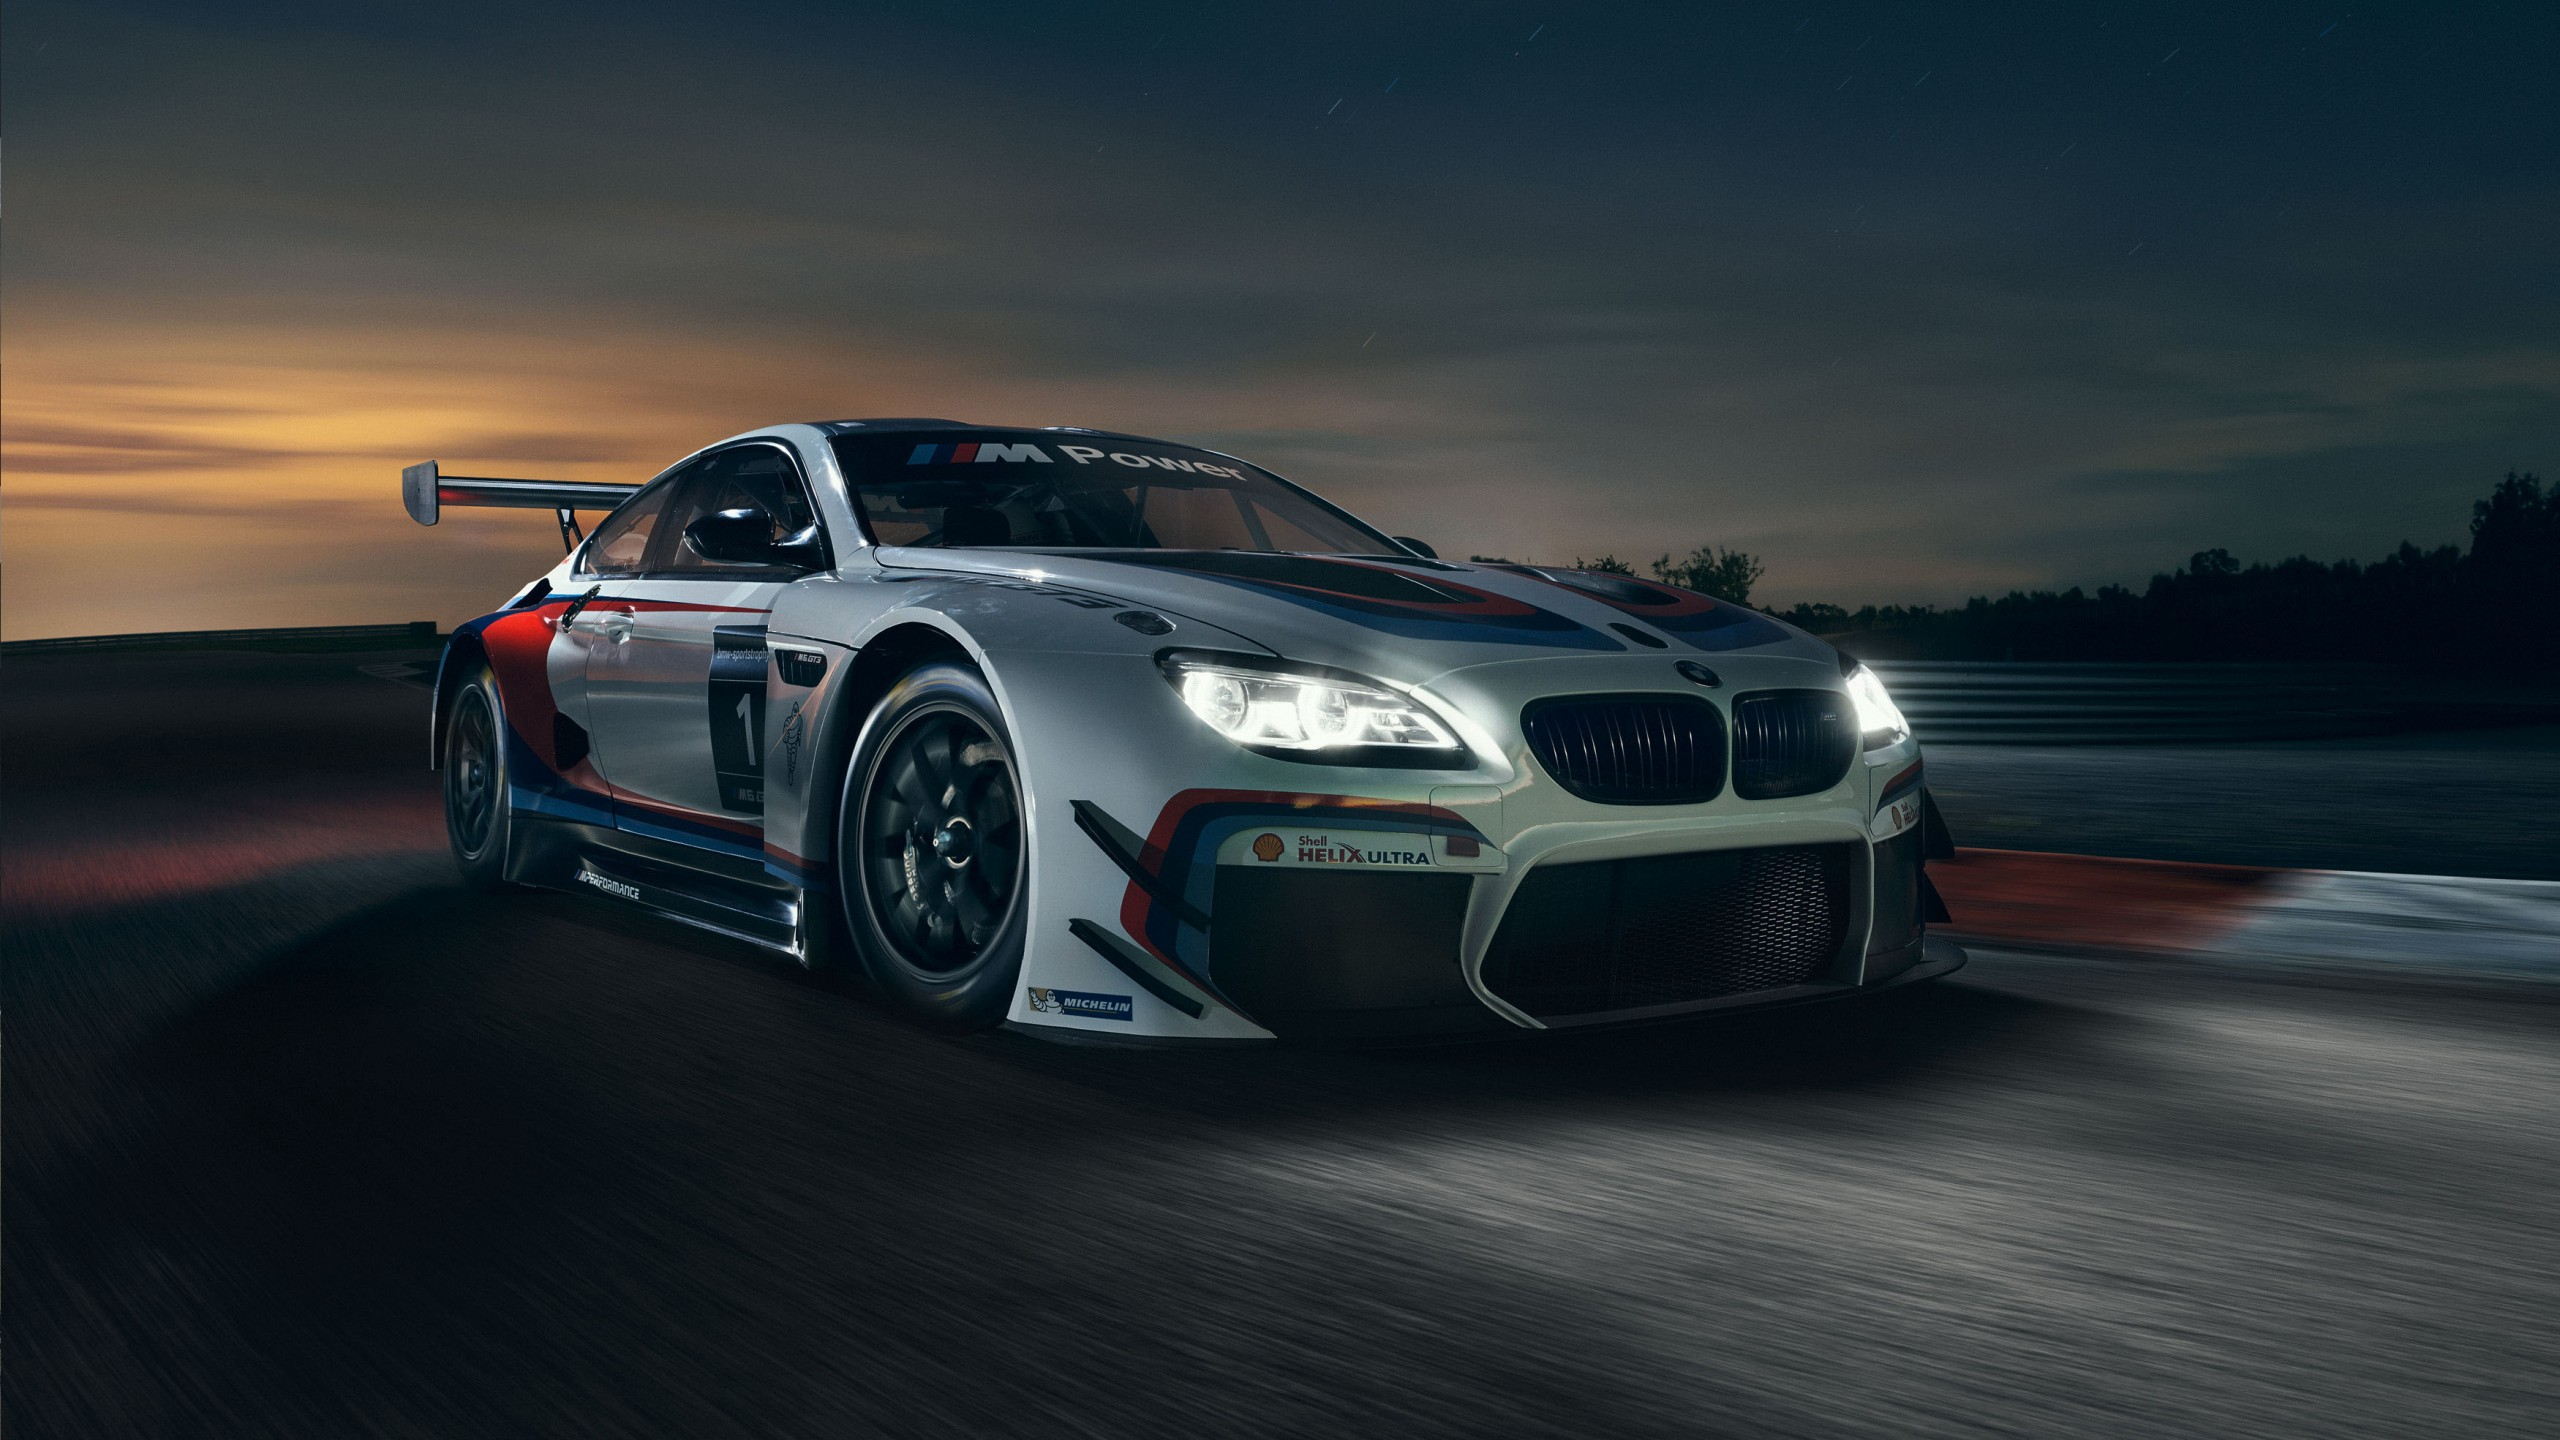 BMW M Power Racing track Wallpaper | HD Car Wallpapers ...